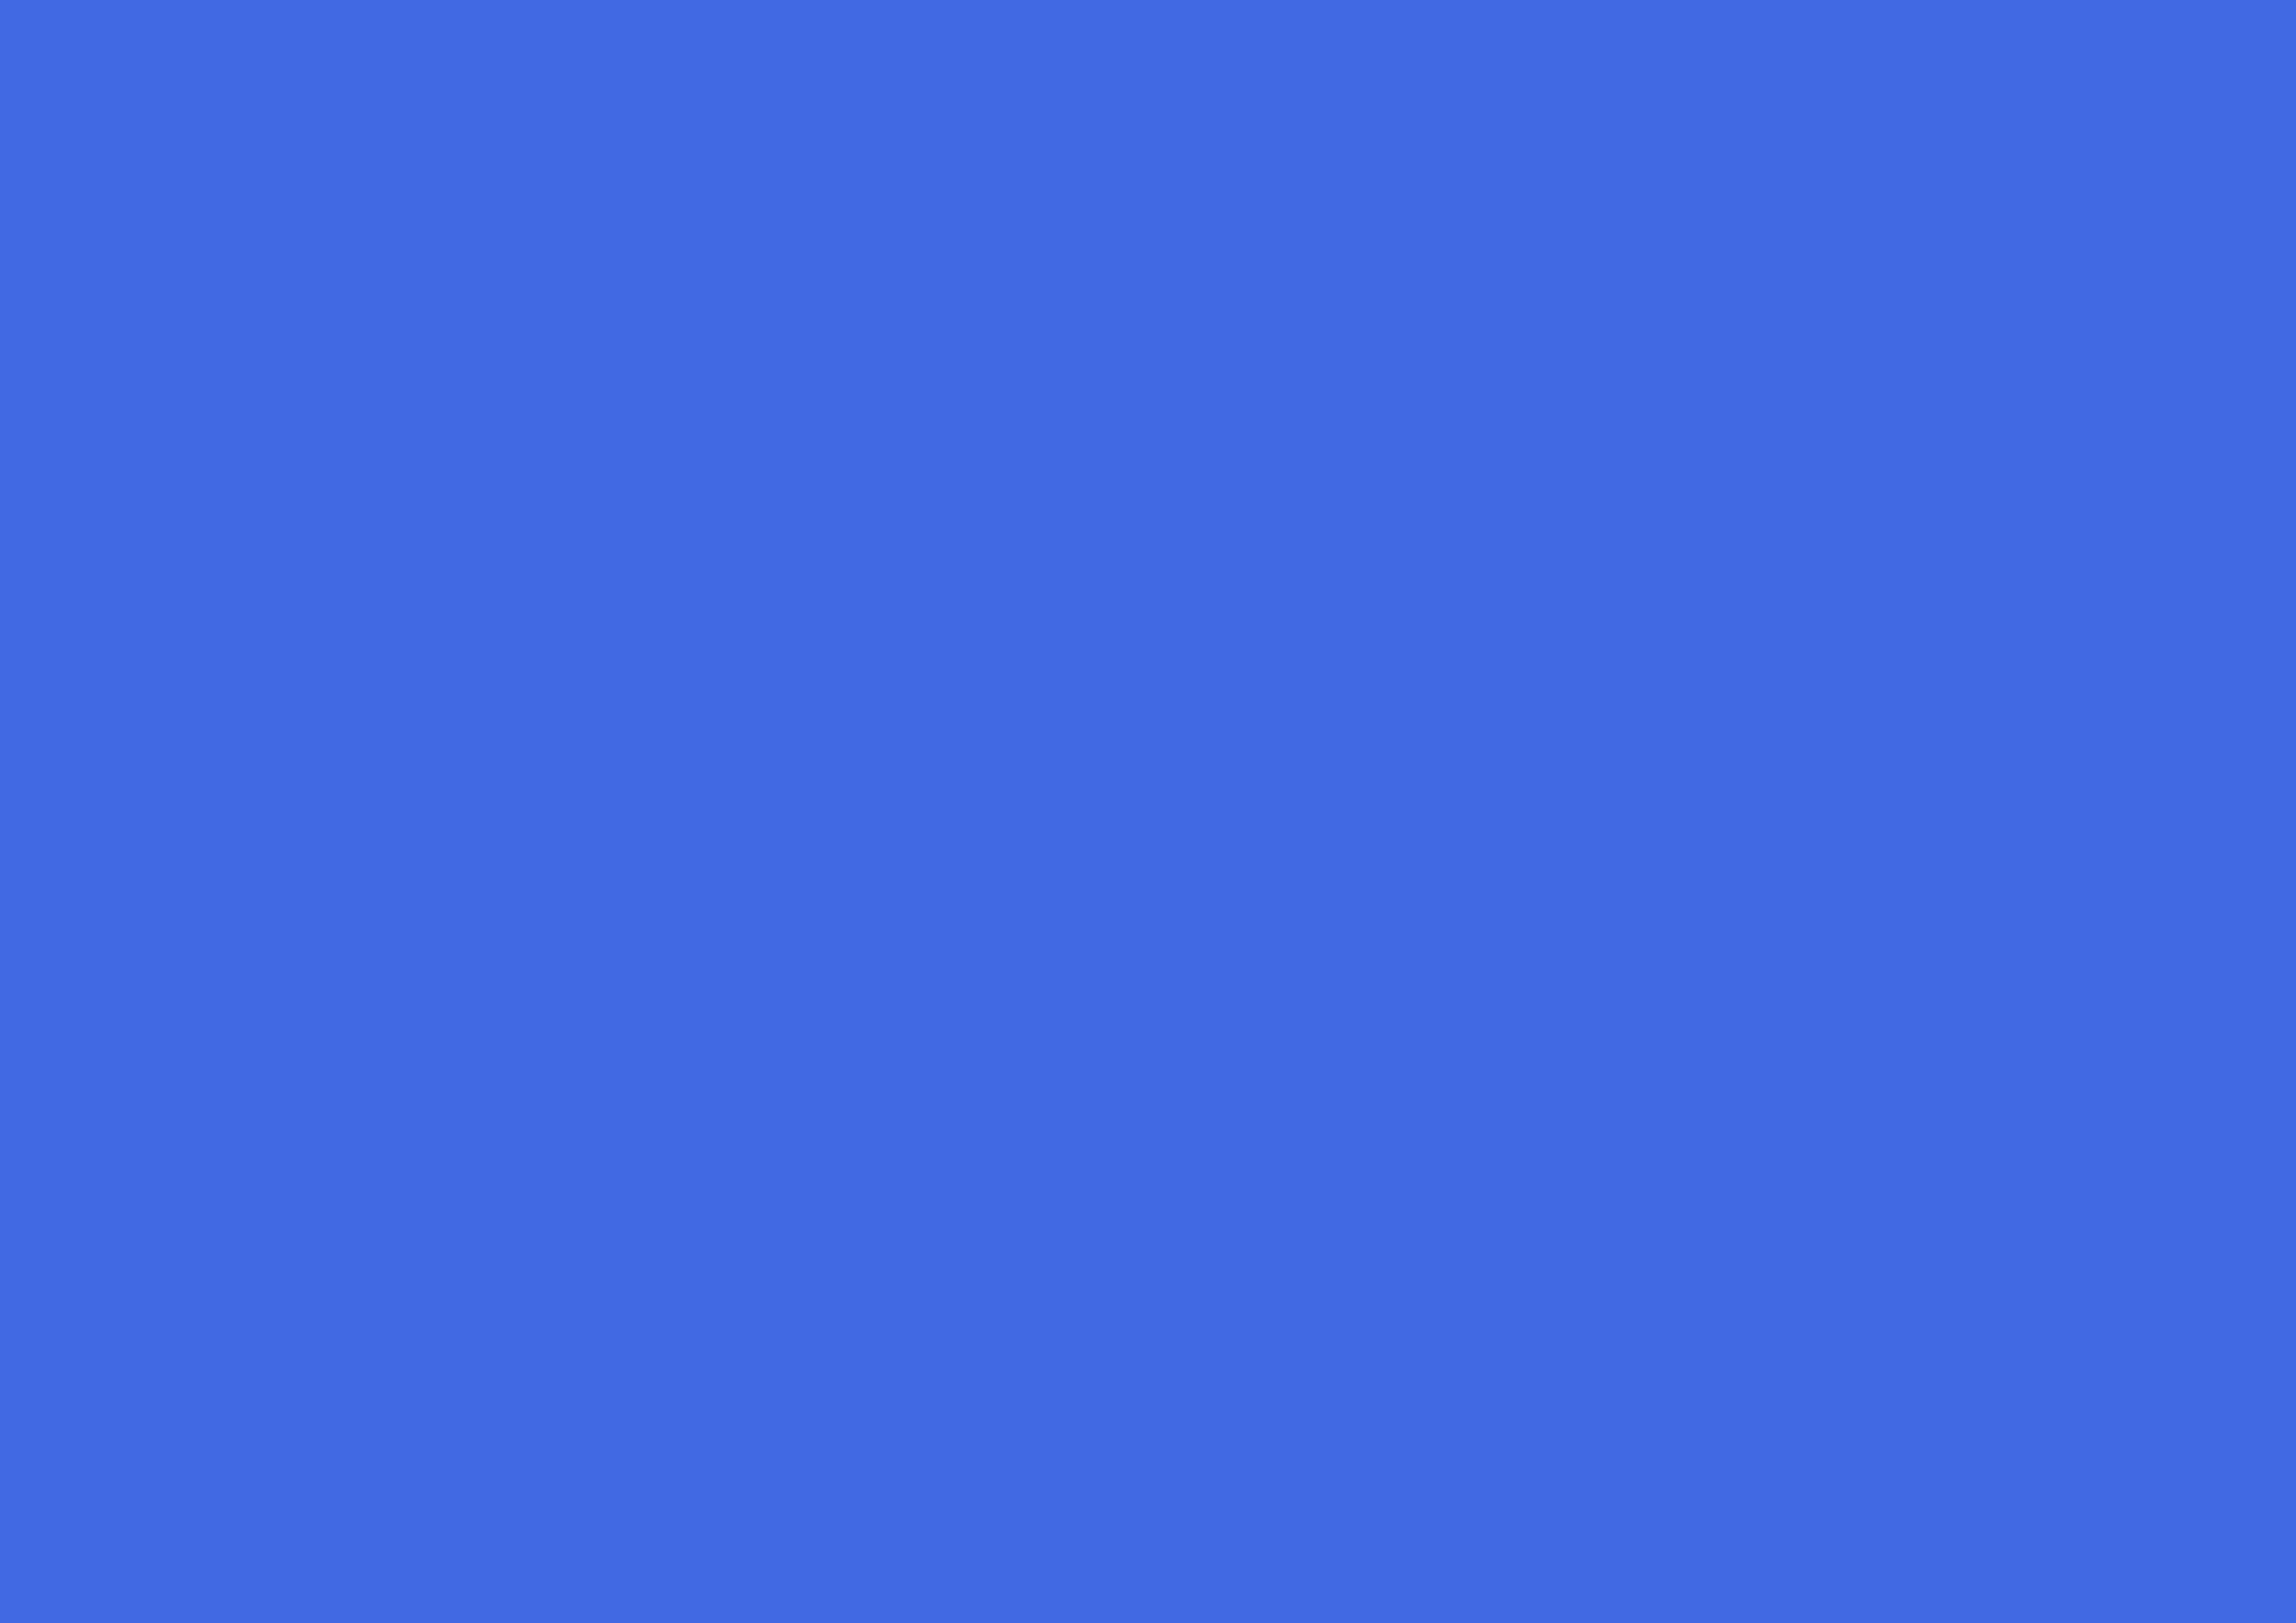 3508x2480 Royal Blue Web Solid Color Background